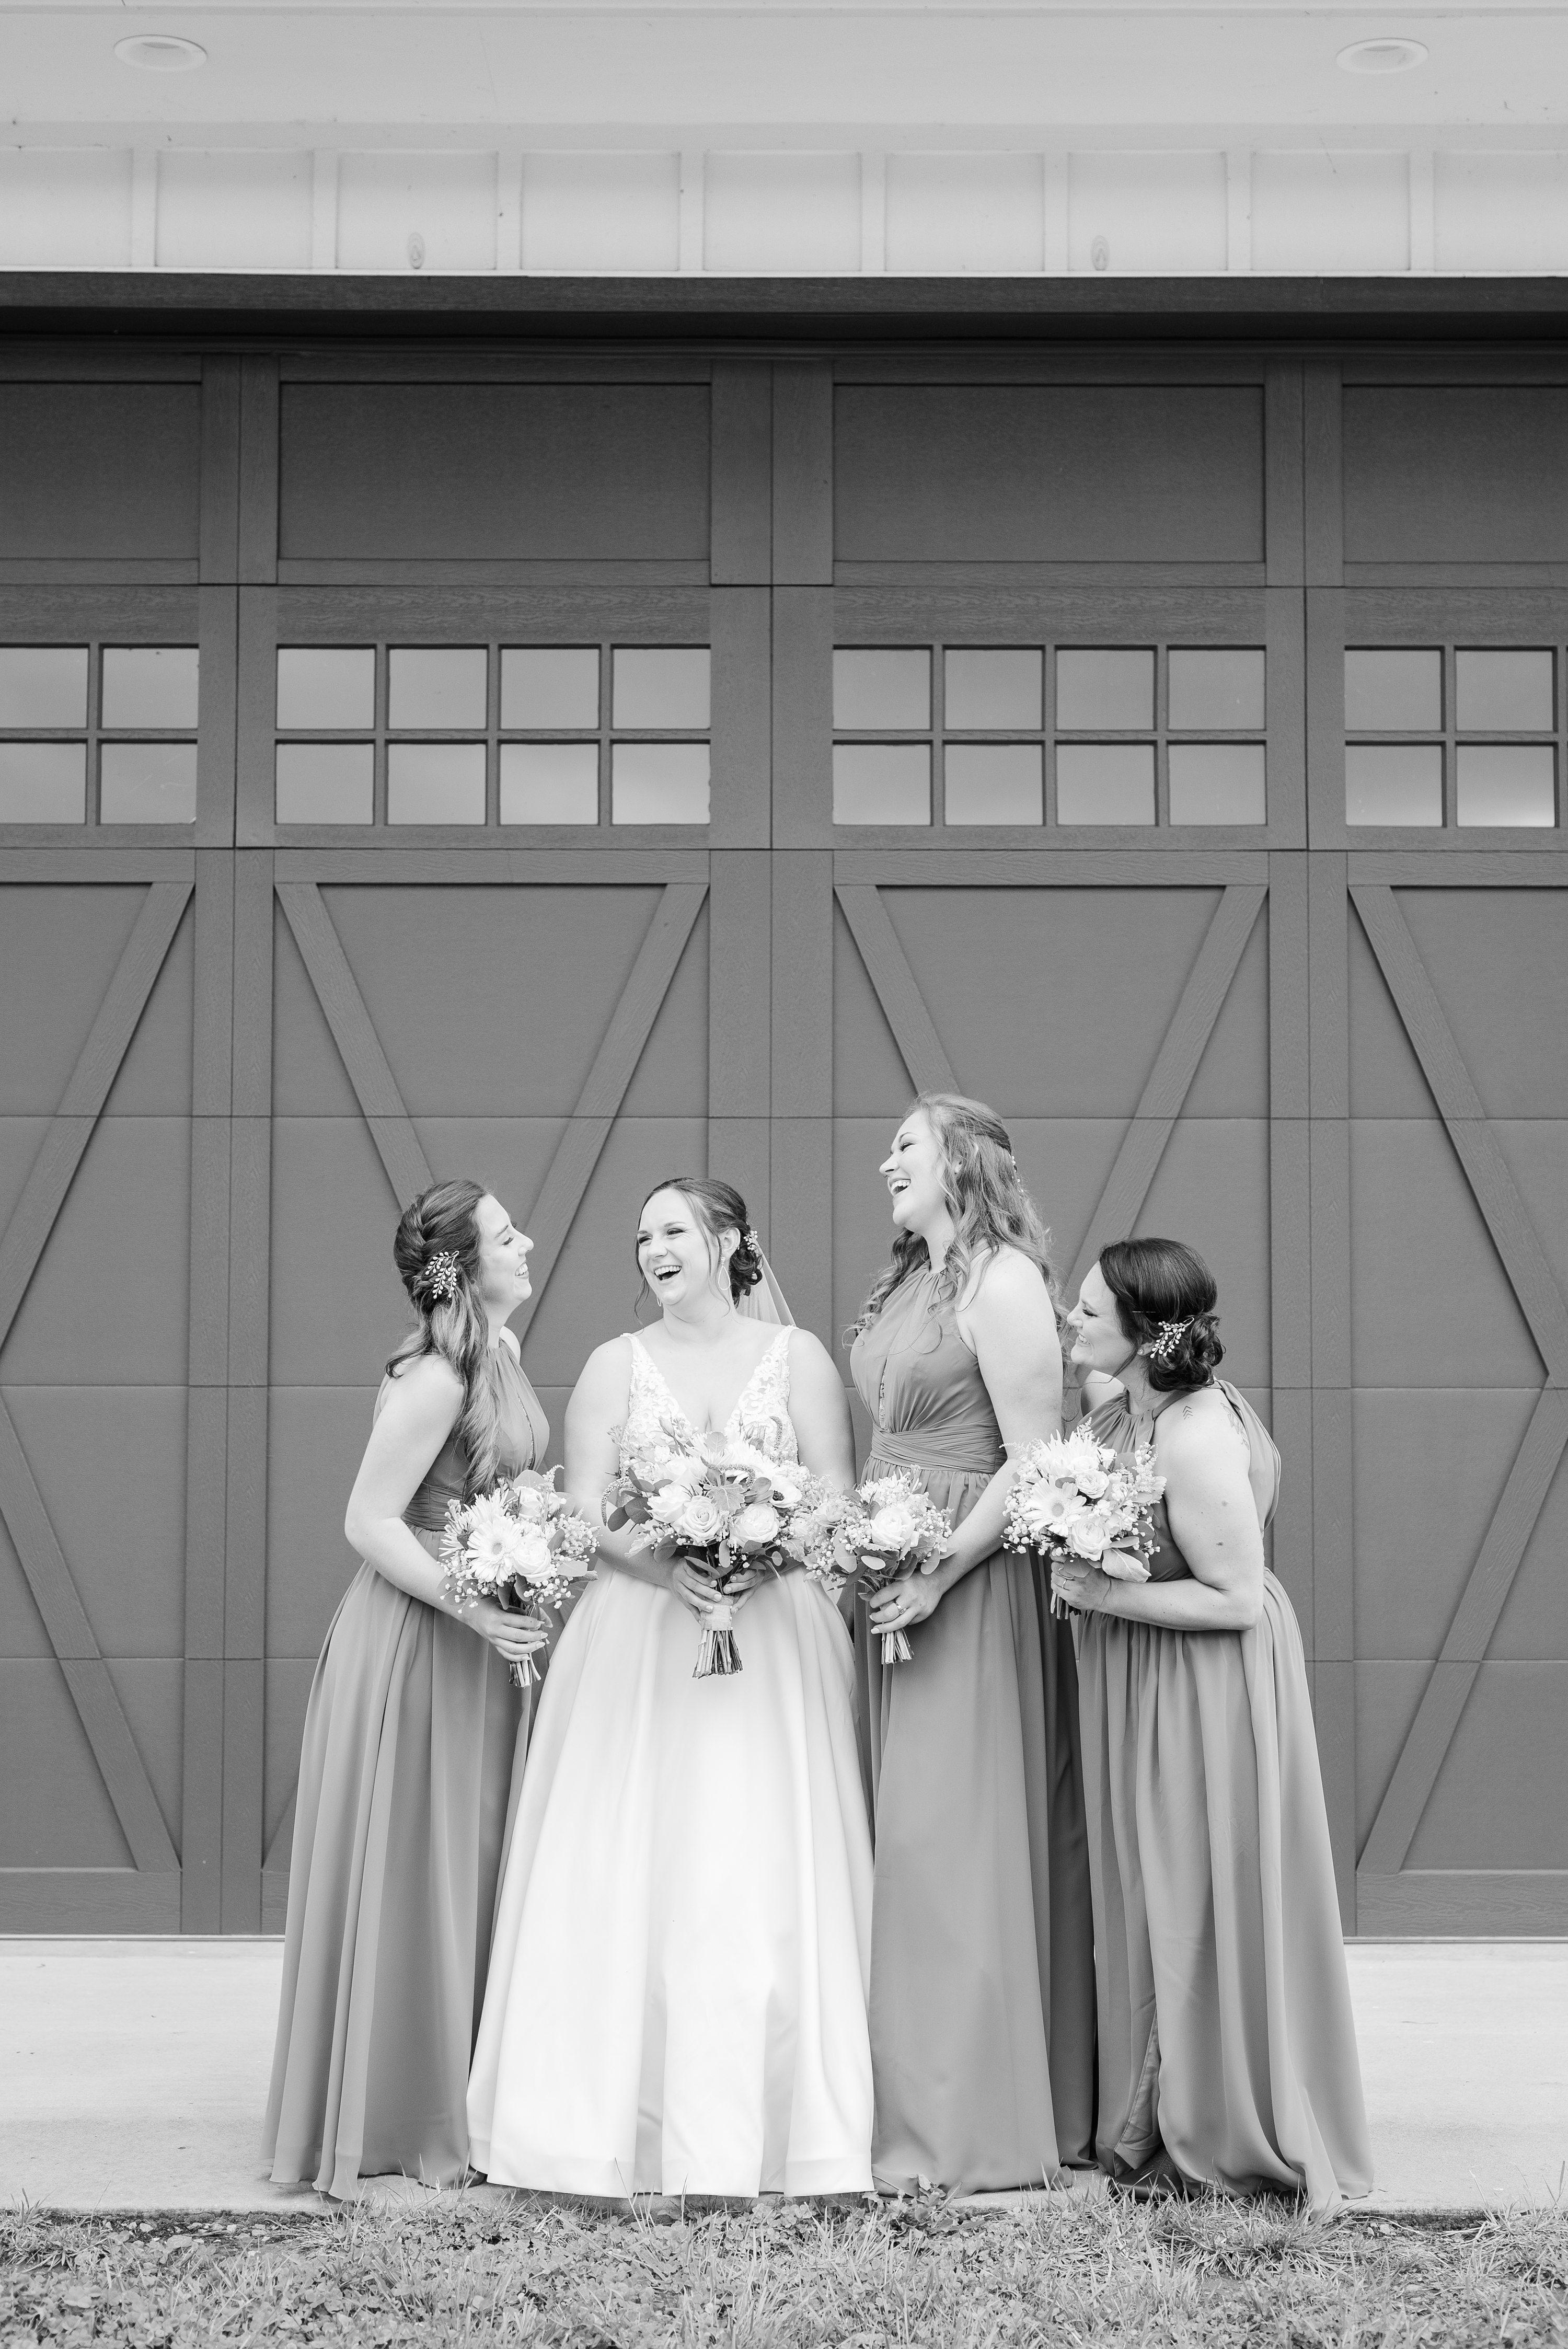 Charlottesville,Barn at Edgewood,bride and bridesmaids,bridesmaids,bride,black and white